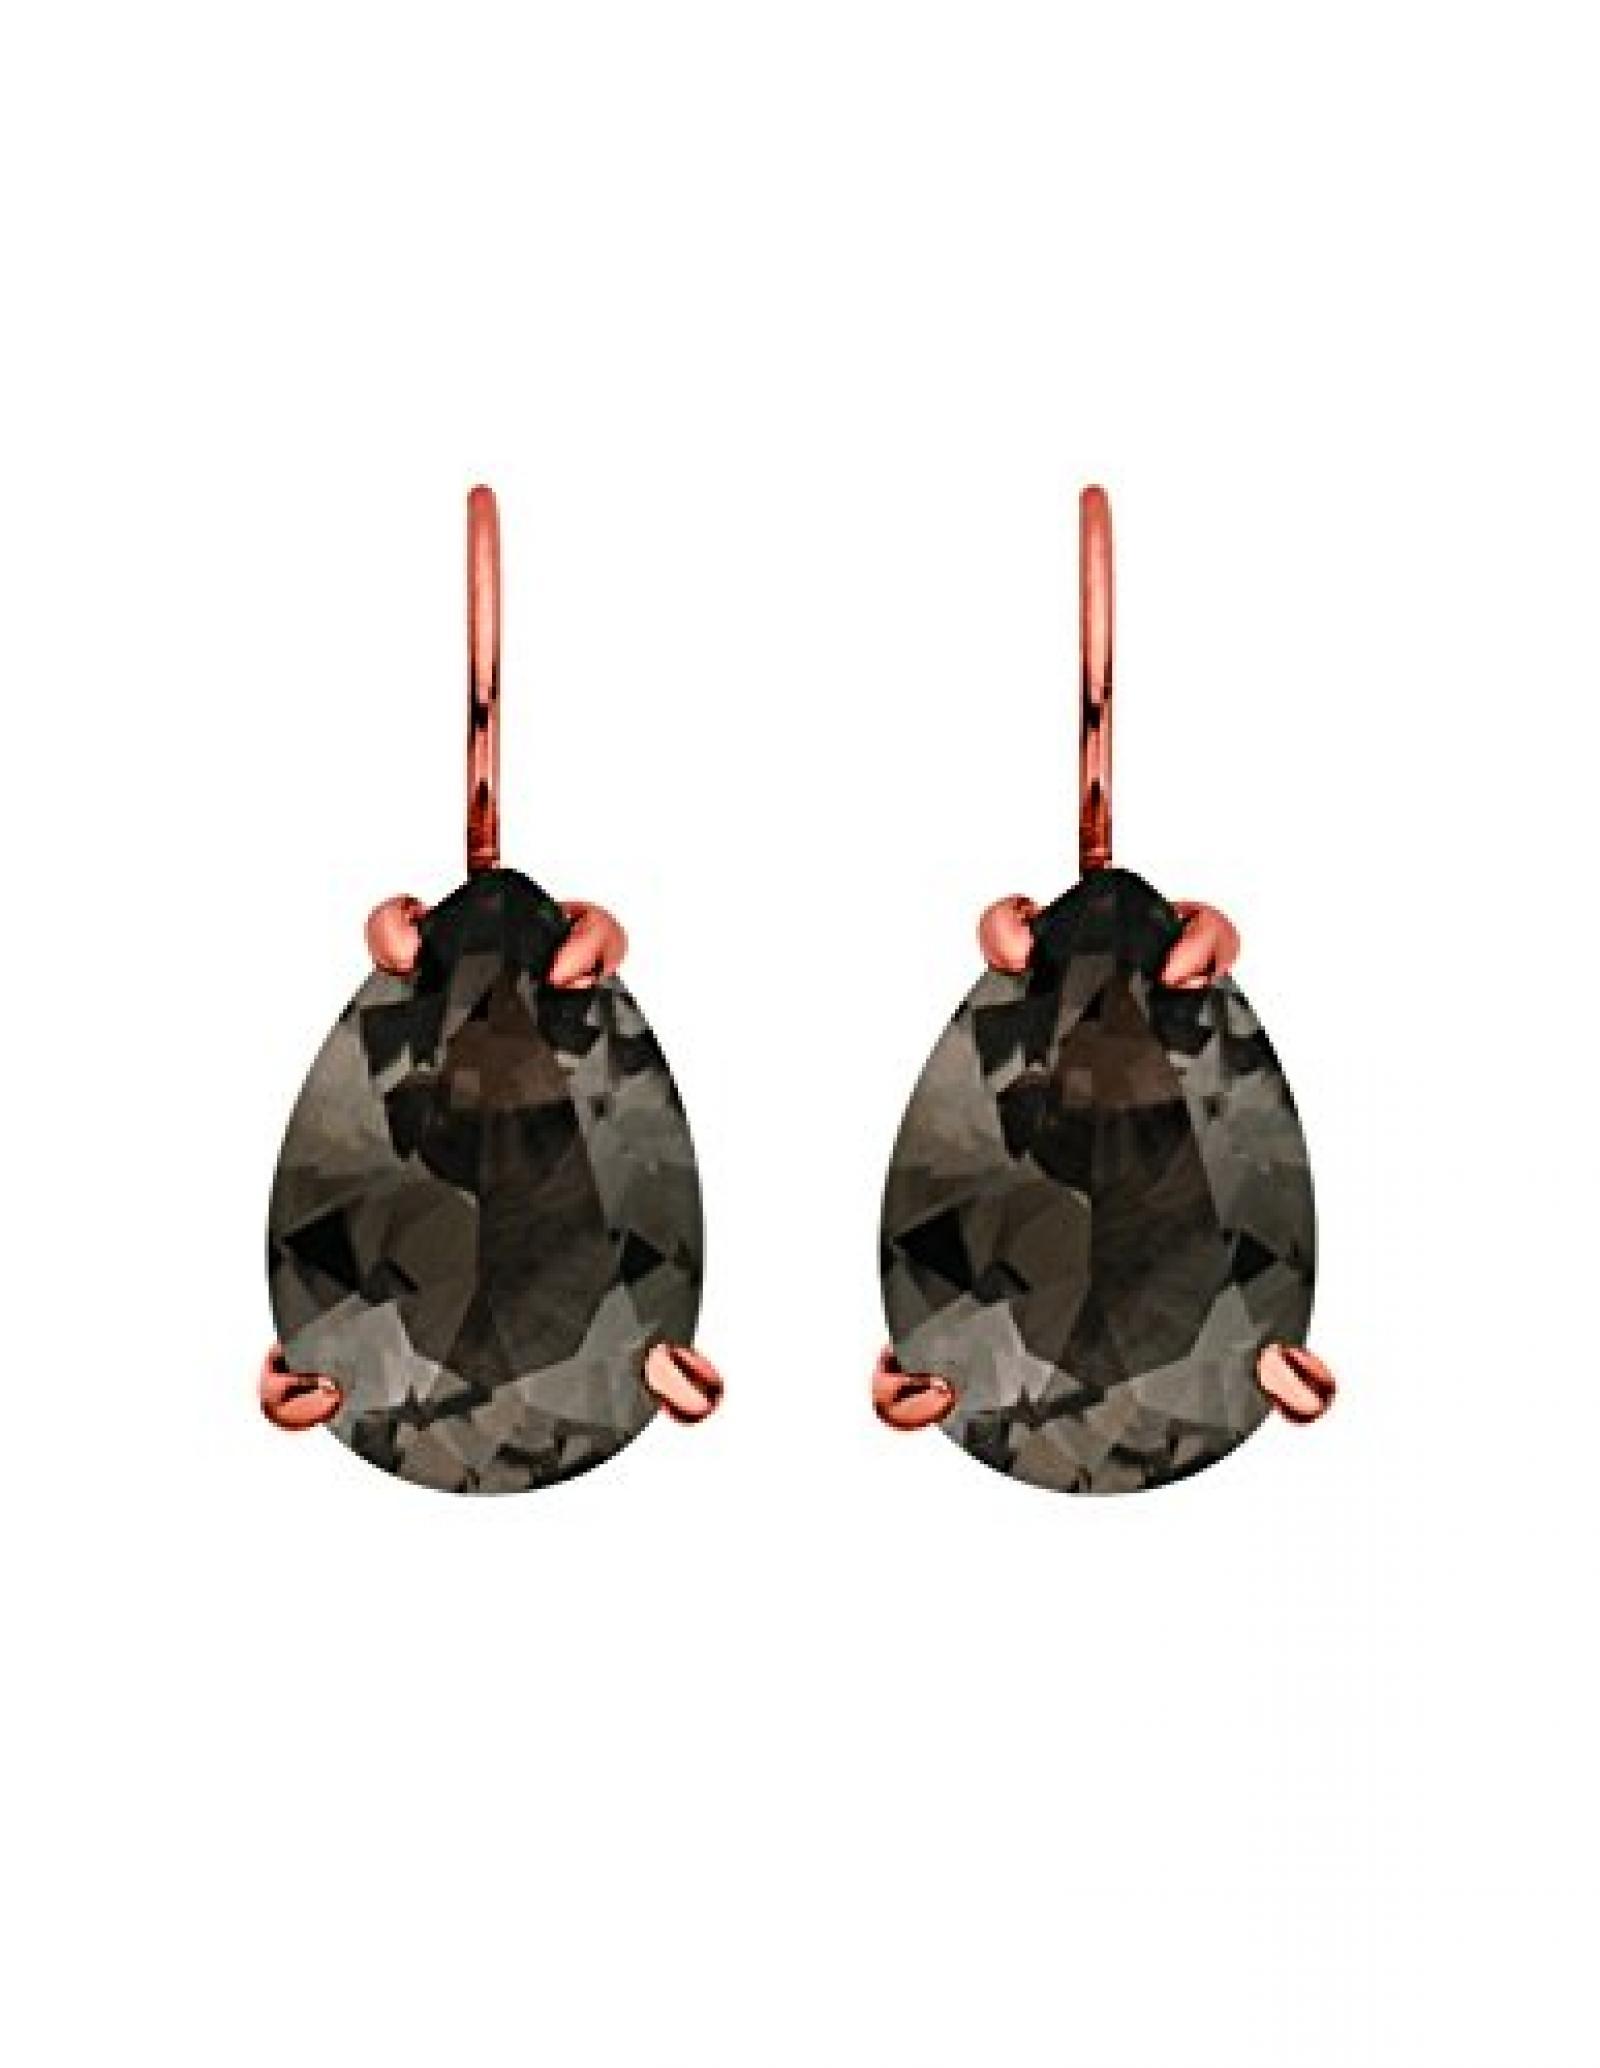 Dyrberg/Kern Damen-Ohrhänger Vergoldetes Metall Kristall braun 335325